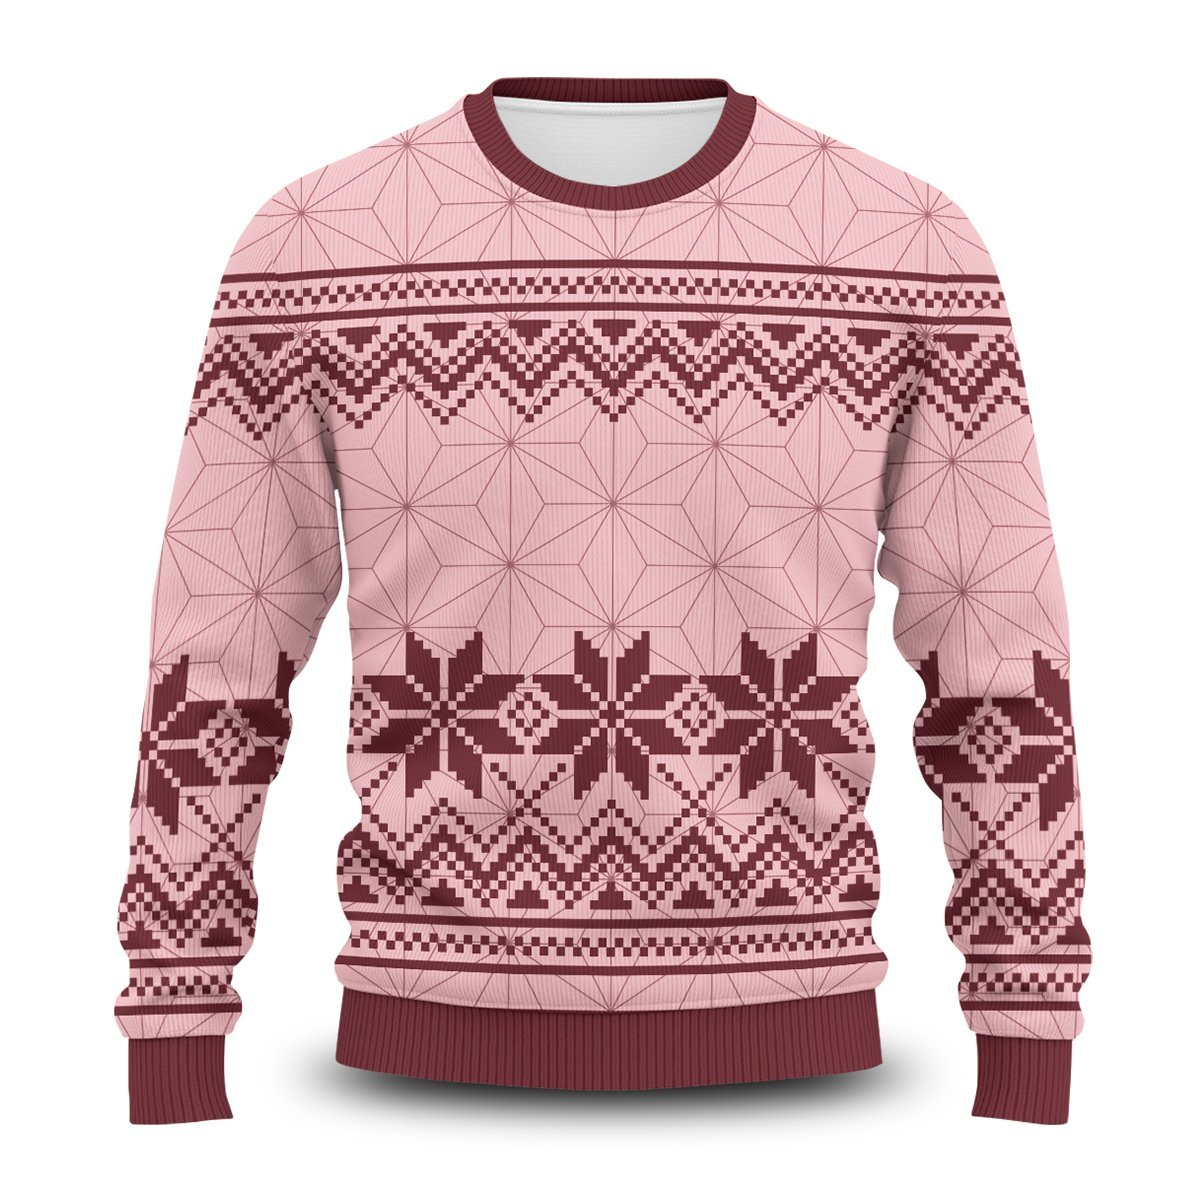 Nezuko Unisex Wool Sweater FDM0310 S Official Otaku Treat Merch